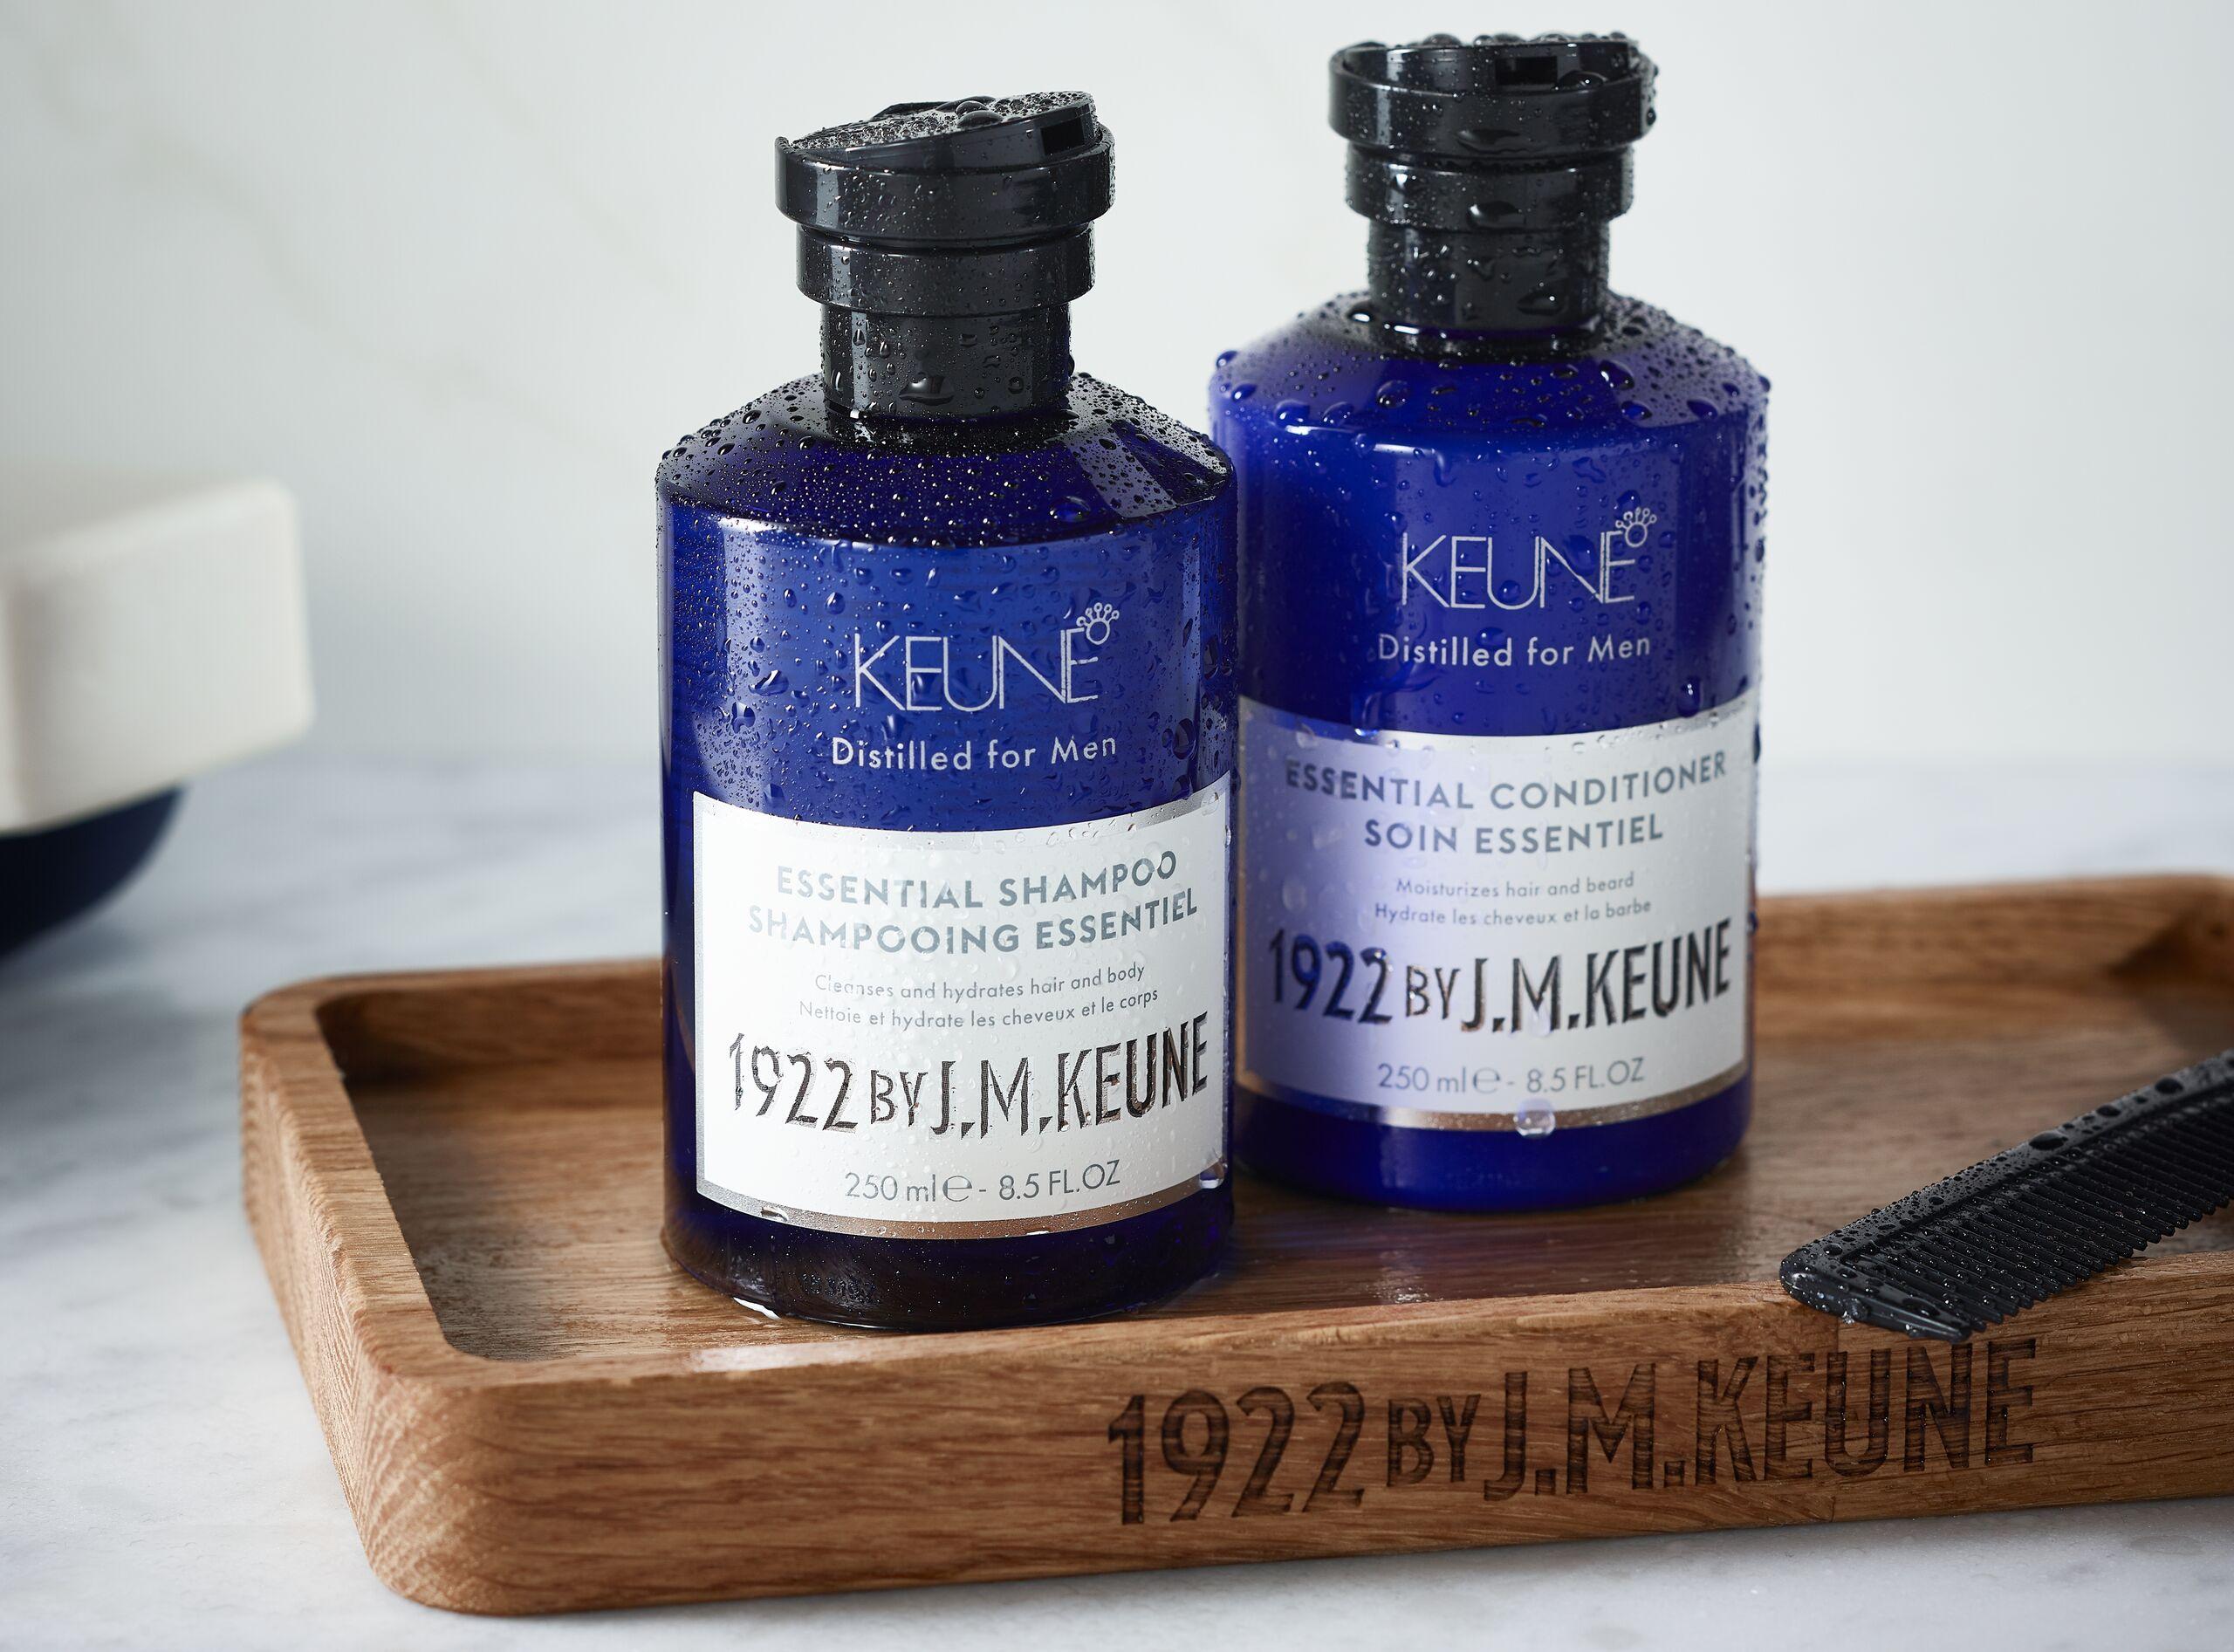 page hero 2560x1893 high-Keune-1922-Essential-shampoo-Conditioner-Group-Lifestyle-API1-1